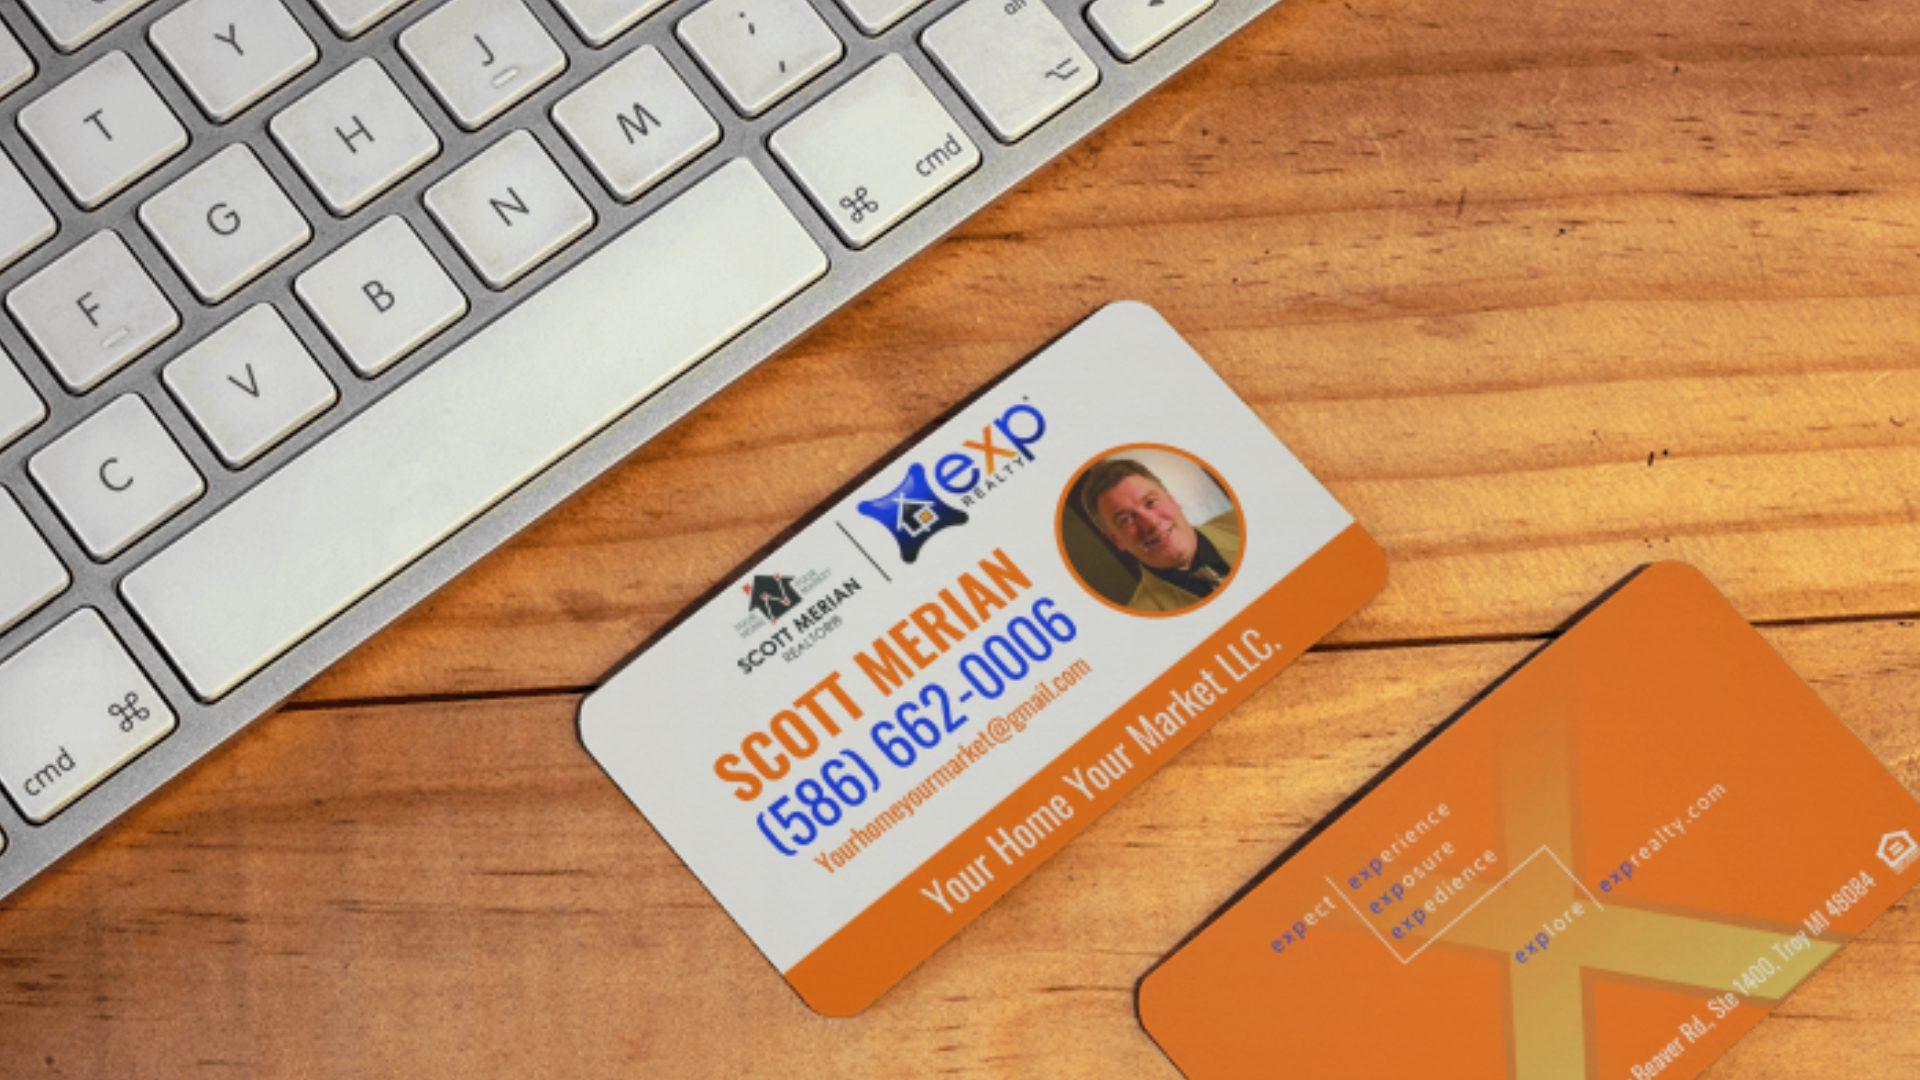 Your Home Your Market LLC - Scott Merian's Cards (4)